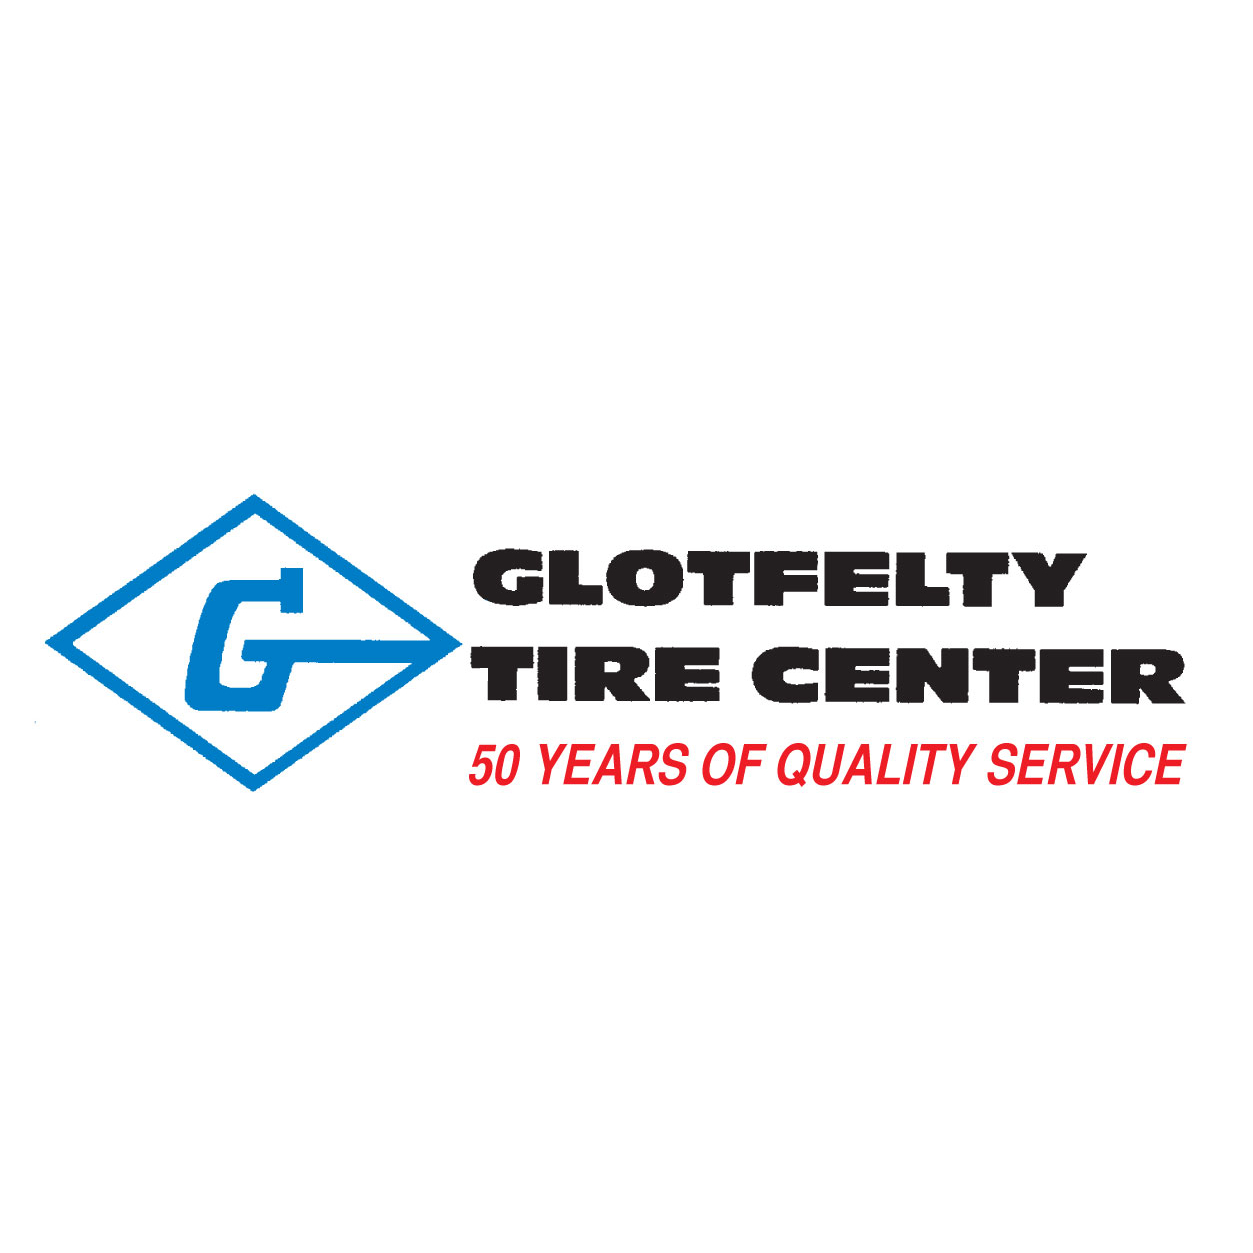 Glotfelty Tire Center image 0